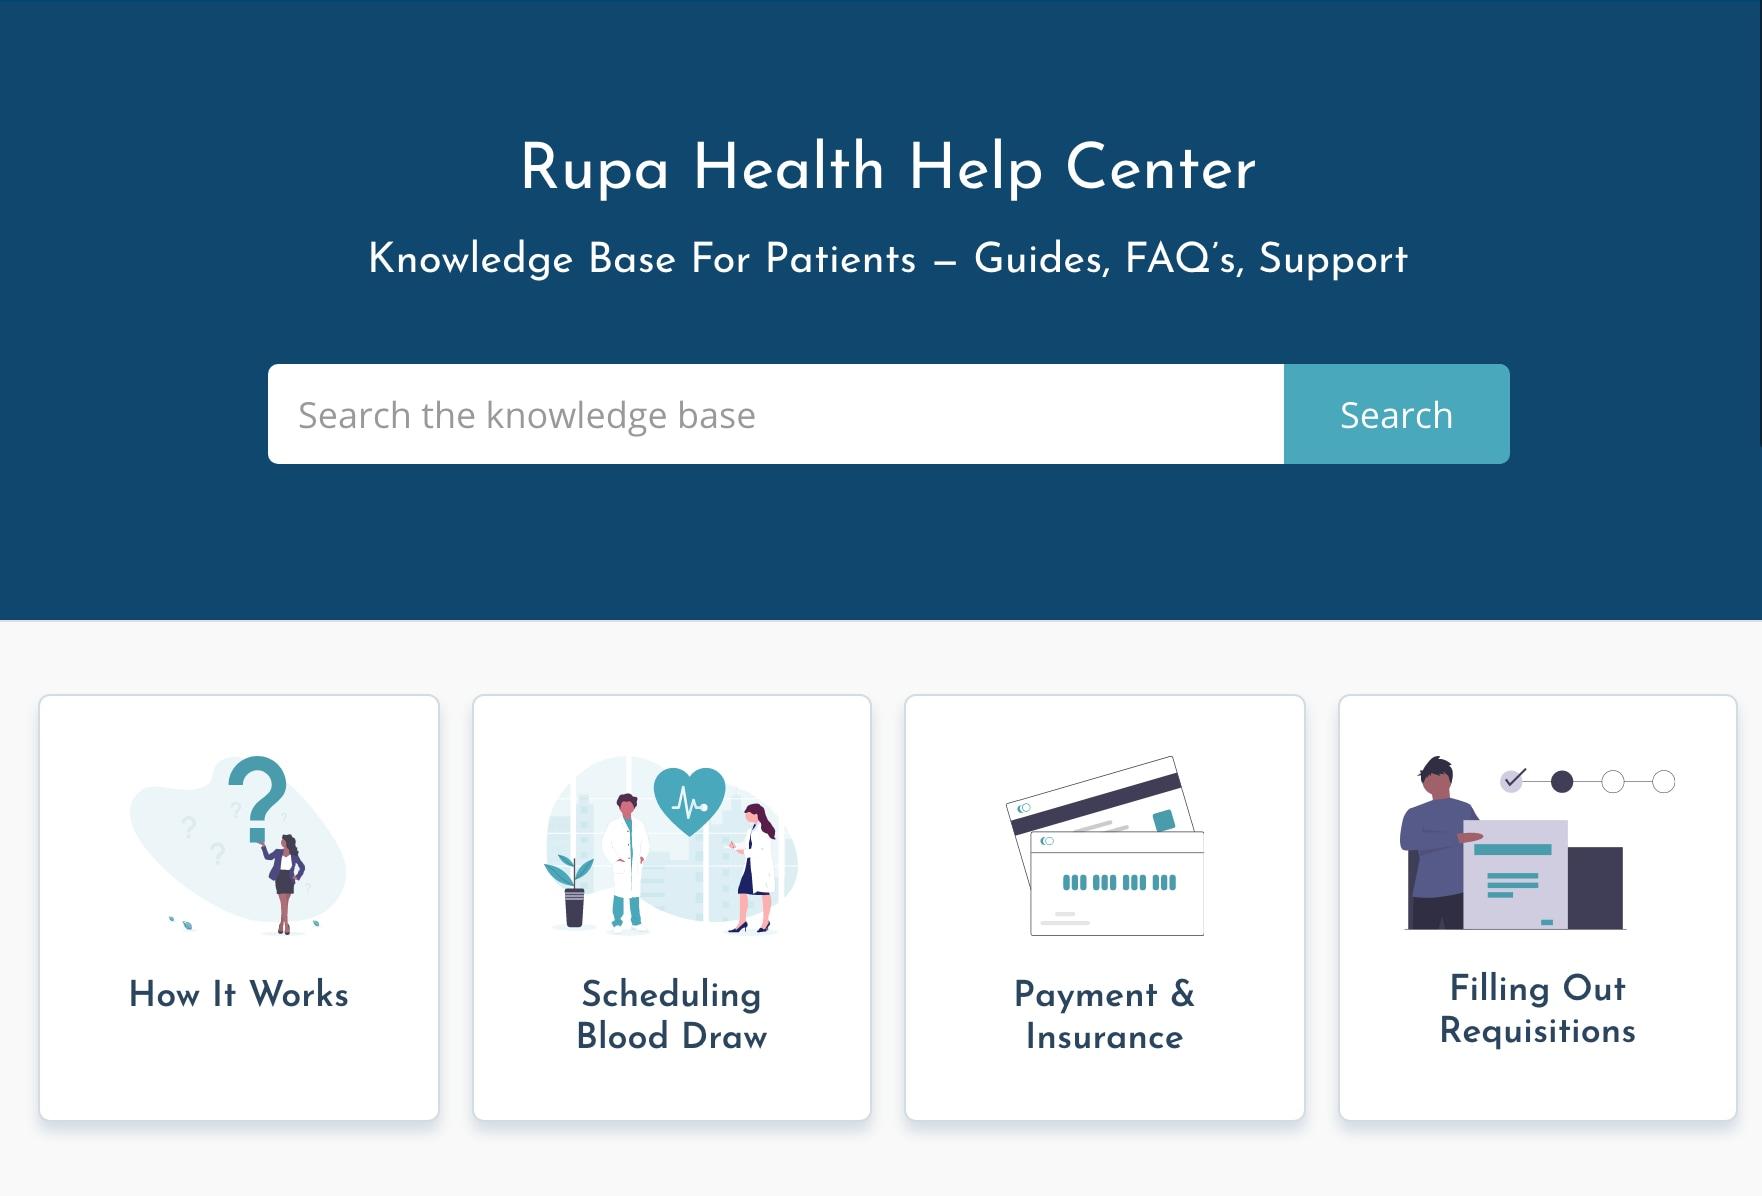 Rupa Patient Help Center